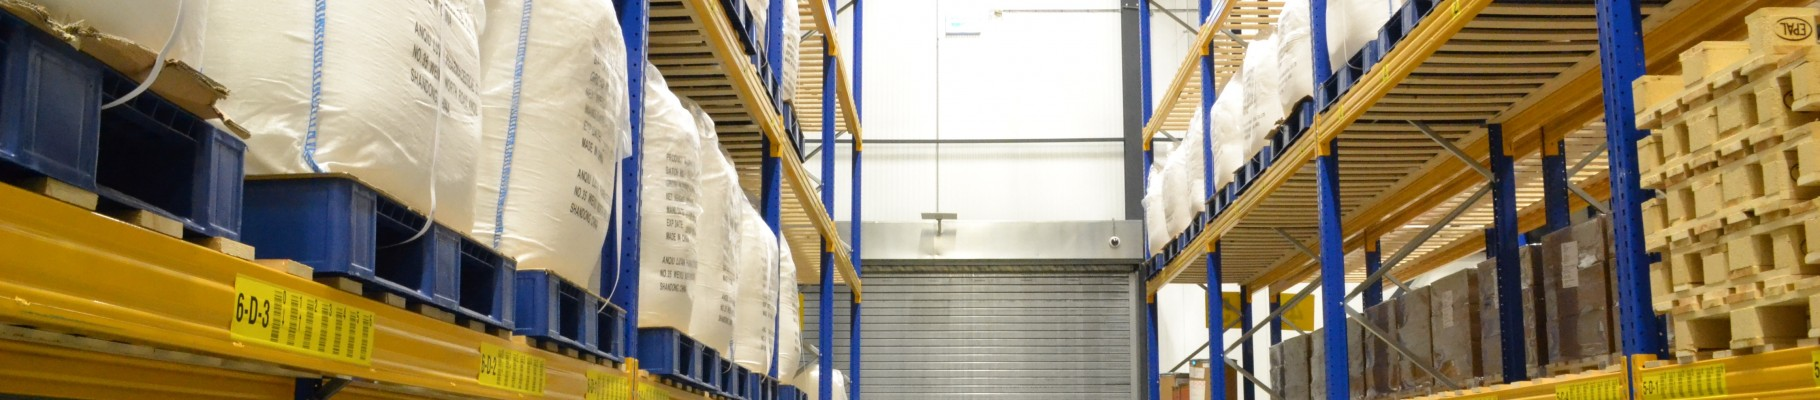 storage of api's Active Pharmaceutical Ingrediënts API - Cyberfreight